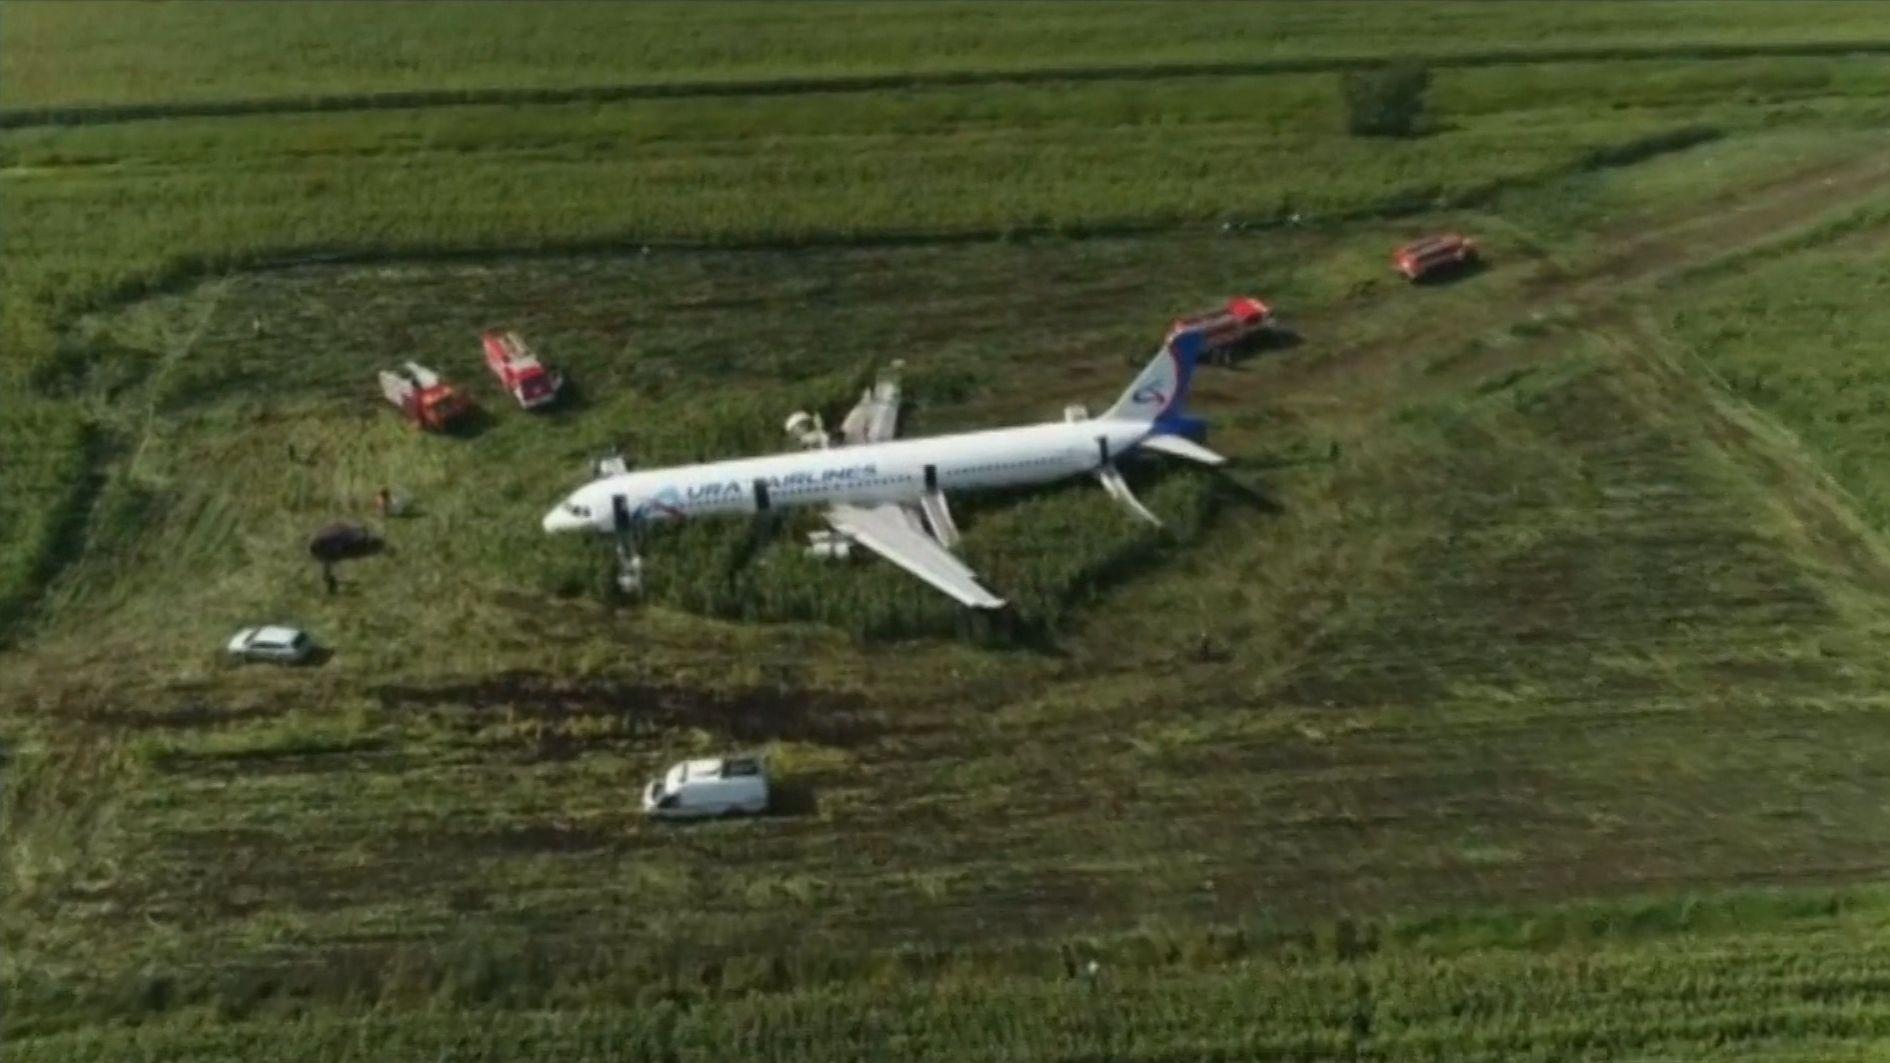 Moskau: Passagierflugzeug landet in Maisfeld